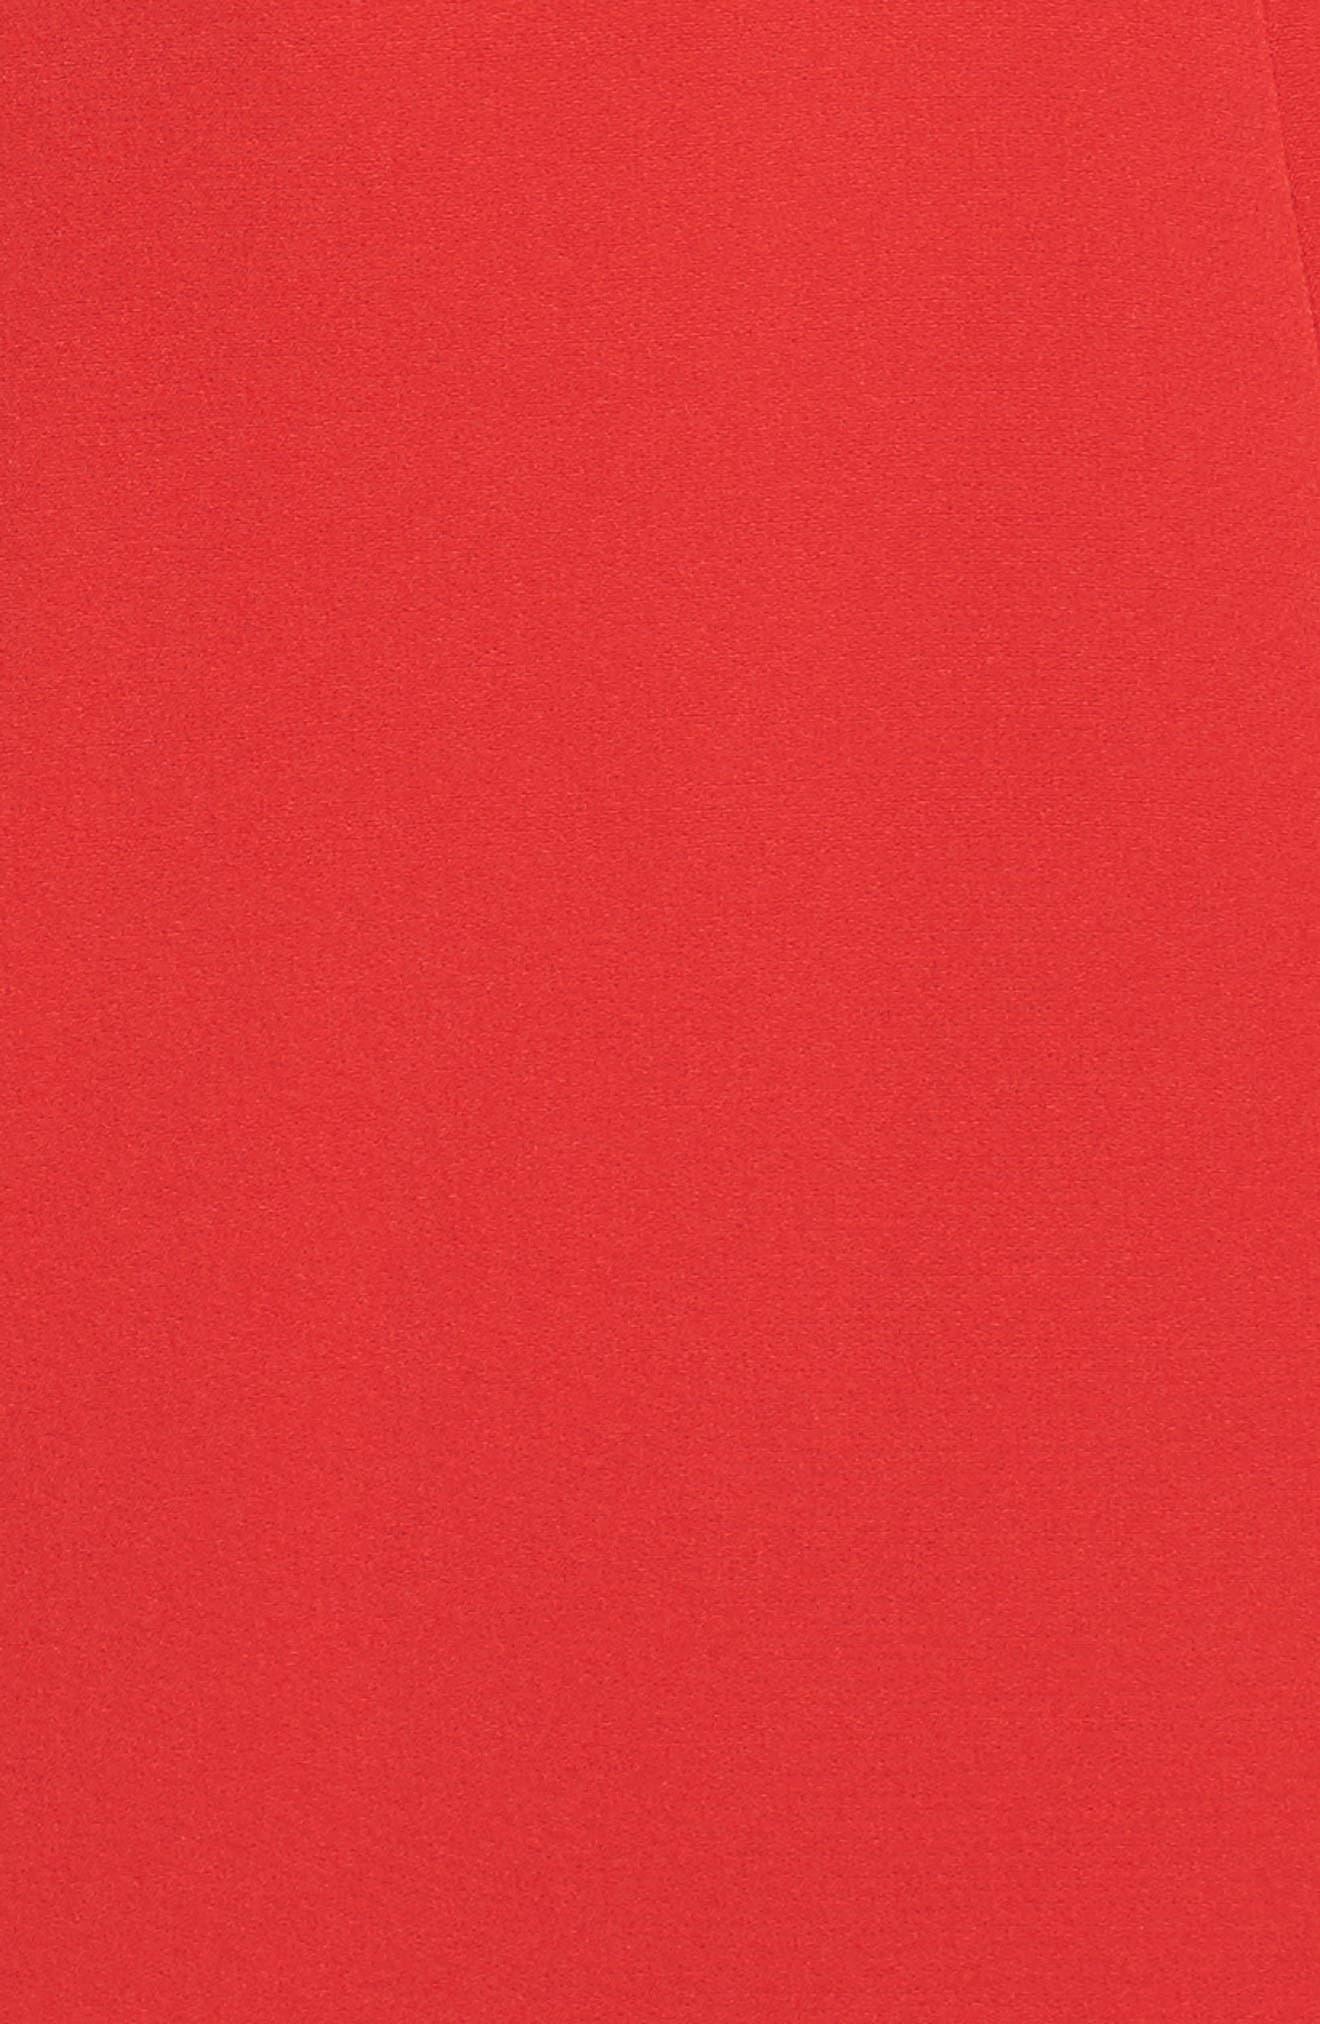 Ruffle Sleeve Sheath Dress,                             Alternate thumbnail 5, color,                             Red